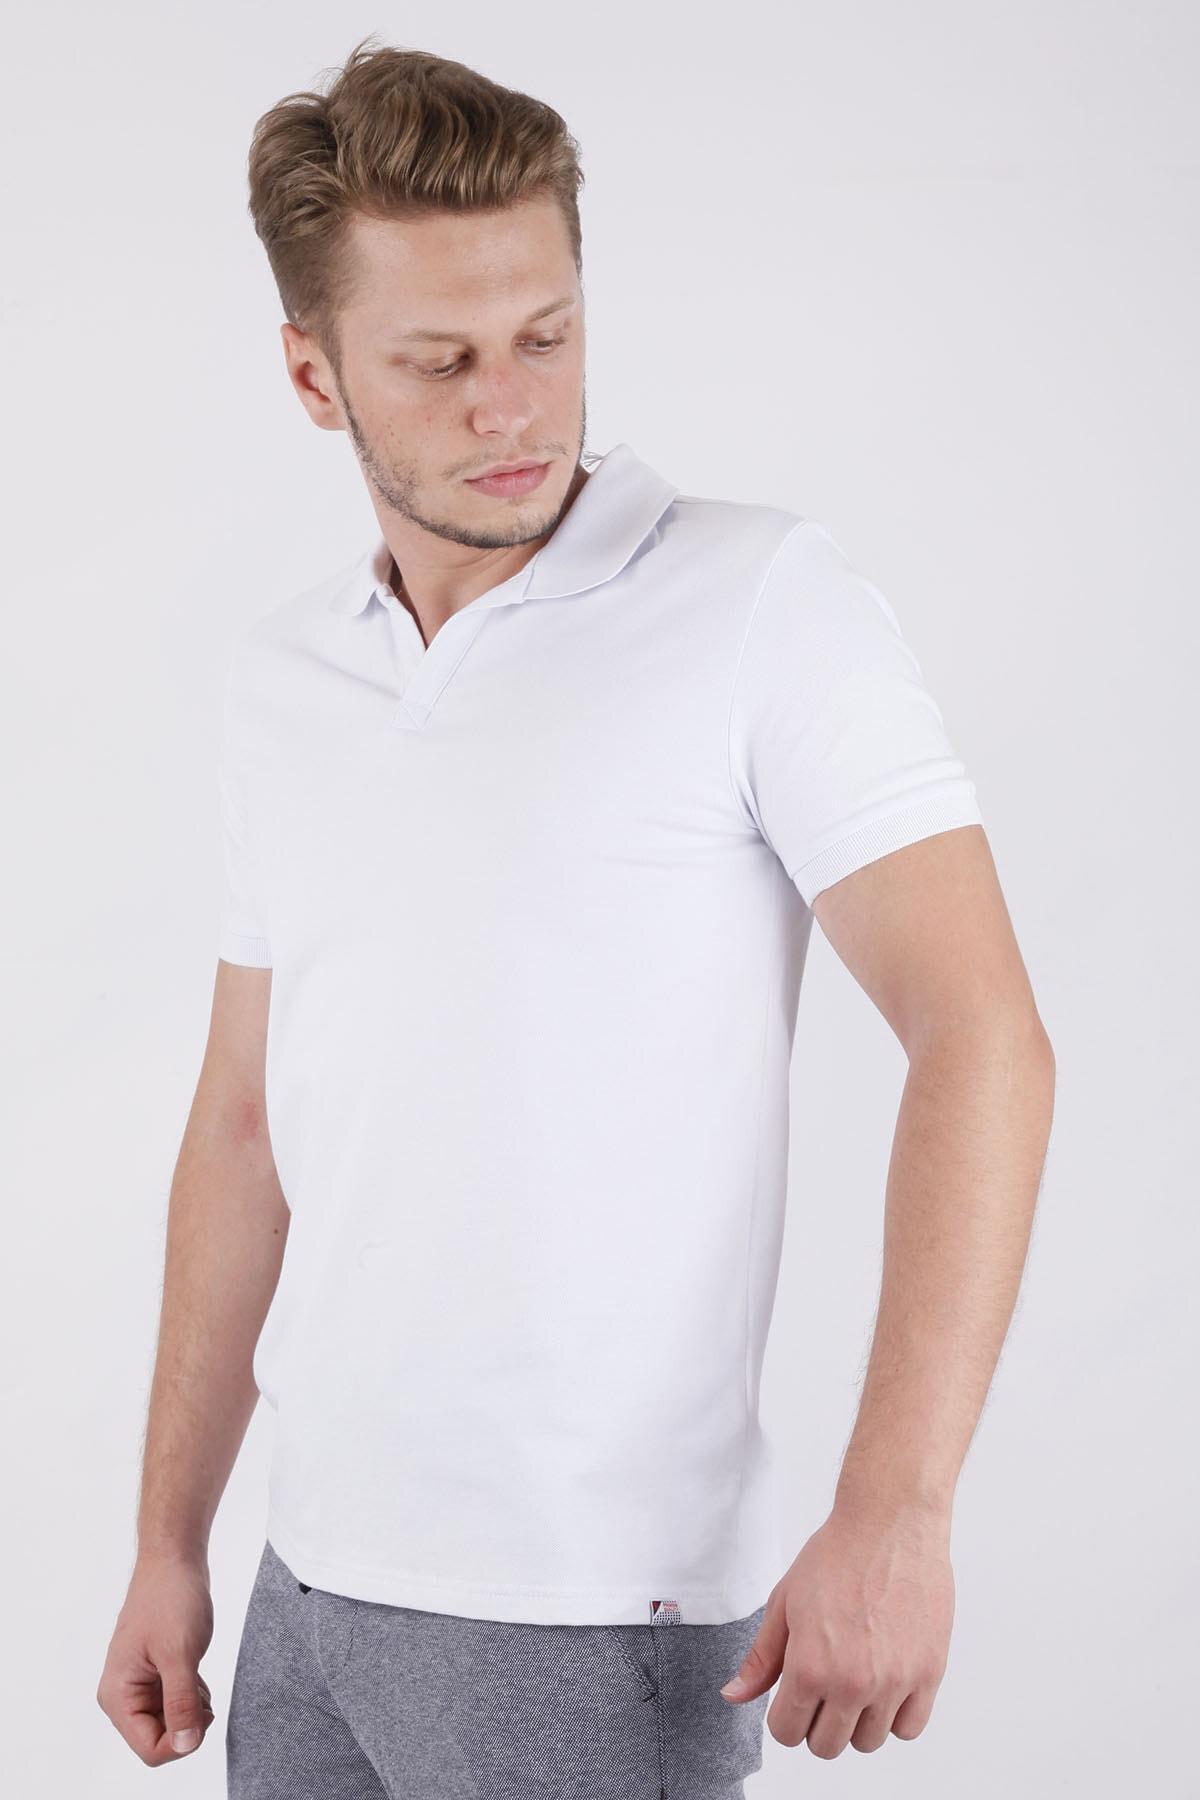 Canelia Erkek Beyaz Renk Slimfit T-shirt 2